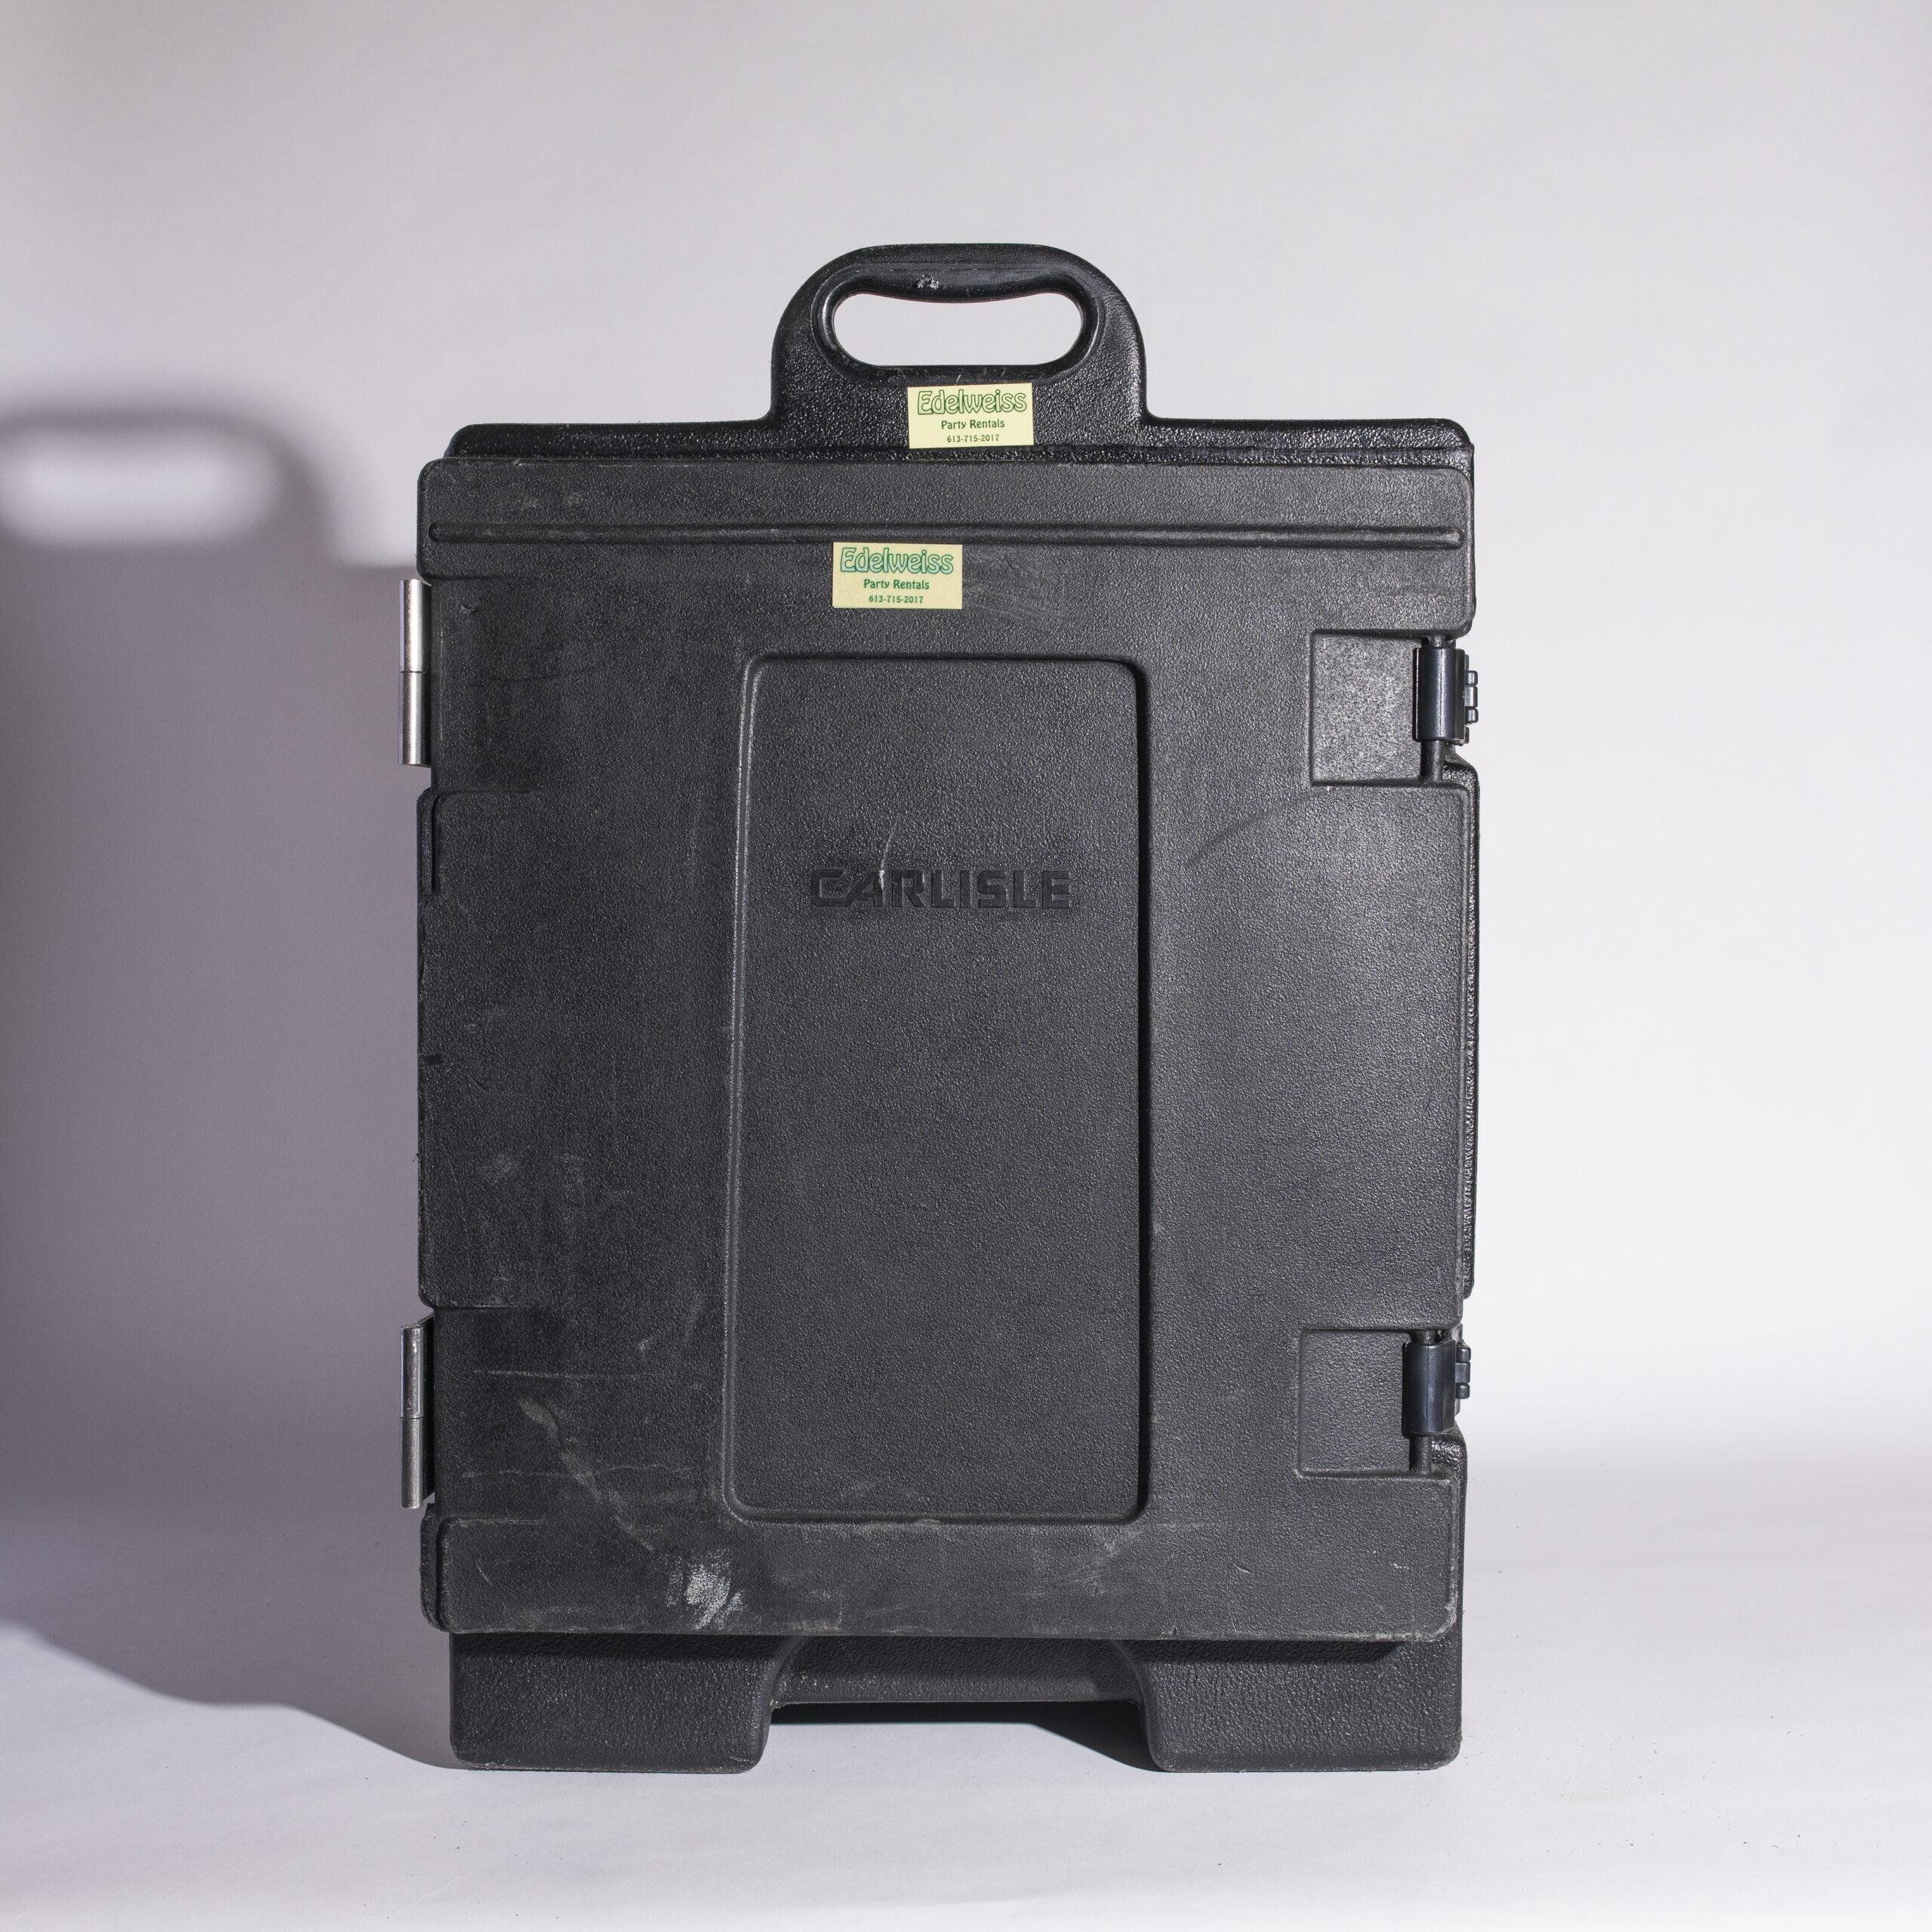 Hot box (half size, plastic)